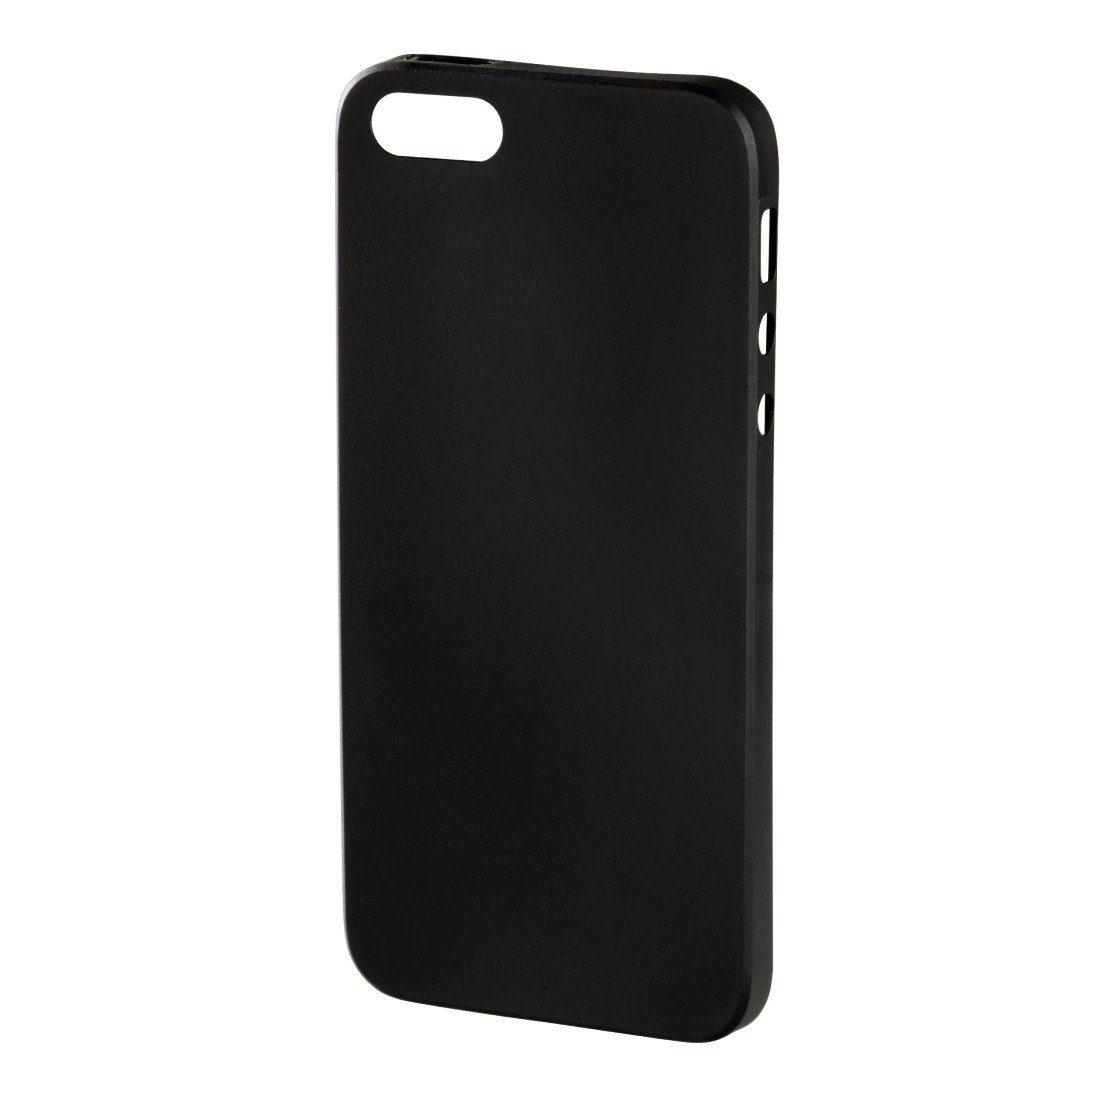 Hama Handy-Cover Ultra Slim für Apple iPhone 5/5s/SE, Schwarz